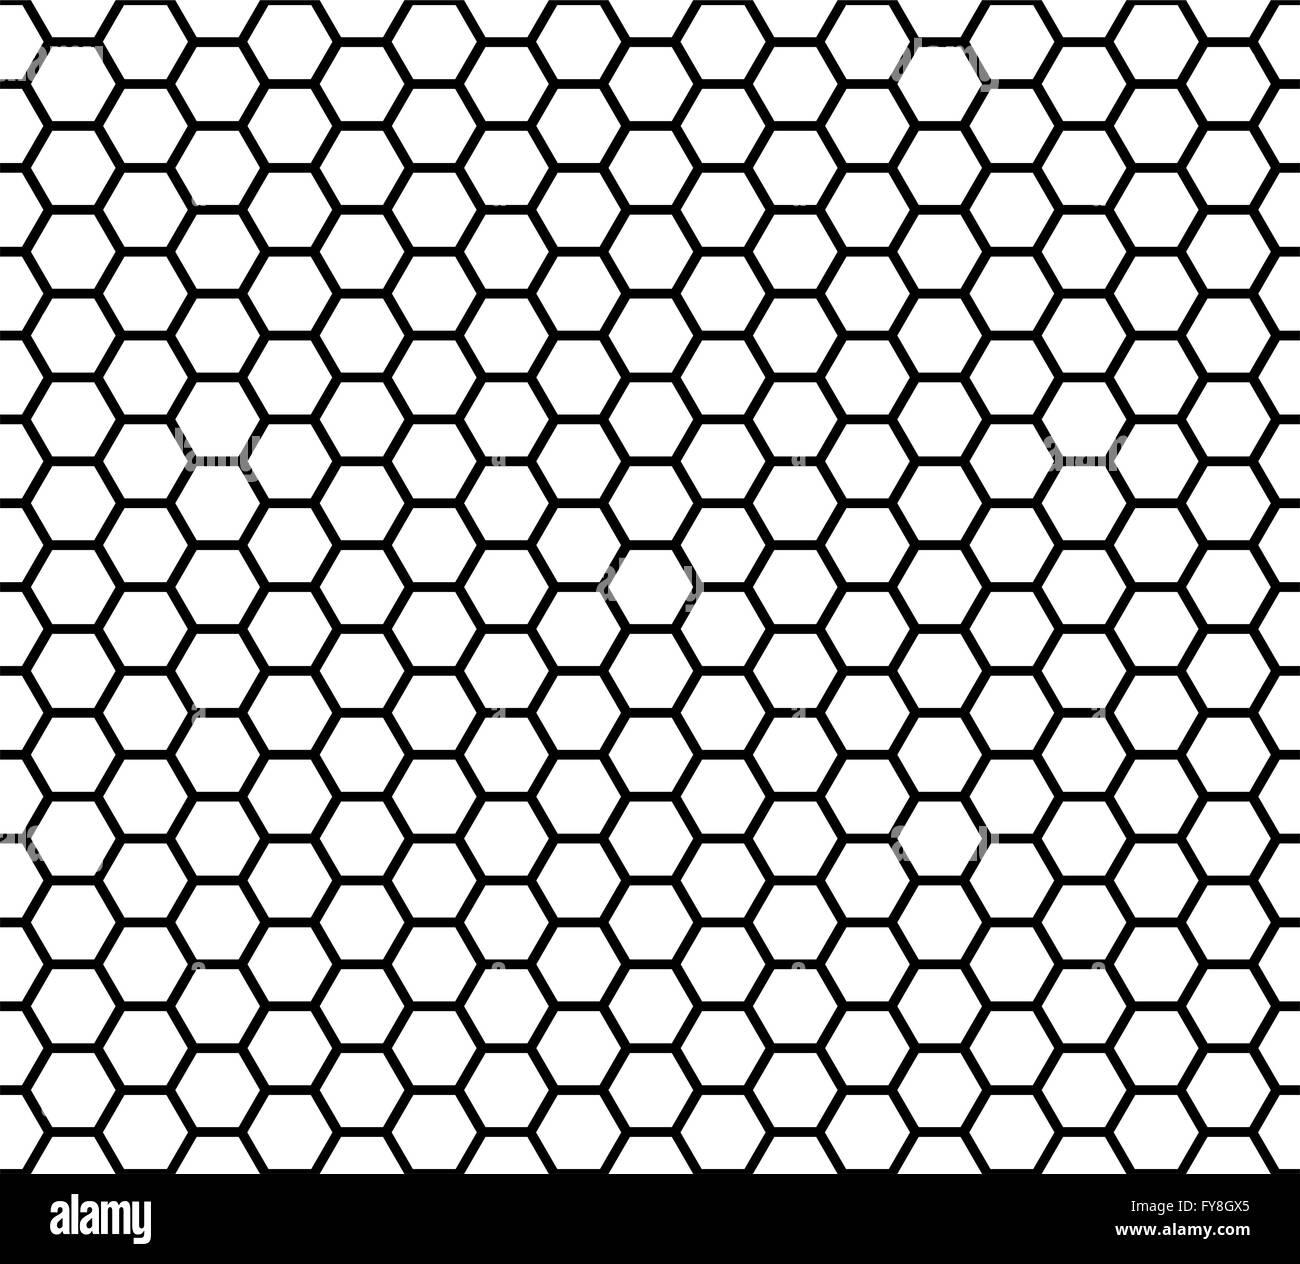 Black And White Geometric Wallpaper Seamless Honeycomb Vector Illustration Stock Vector Art